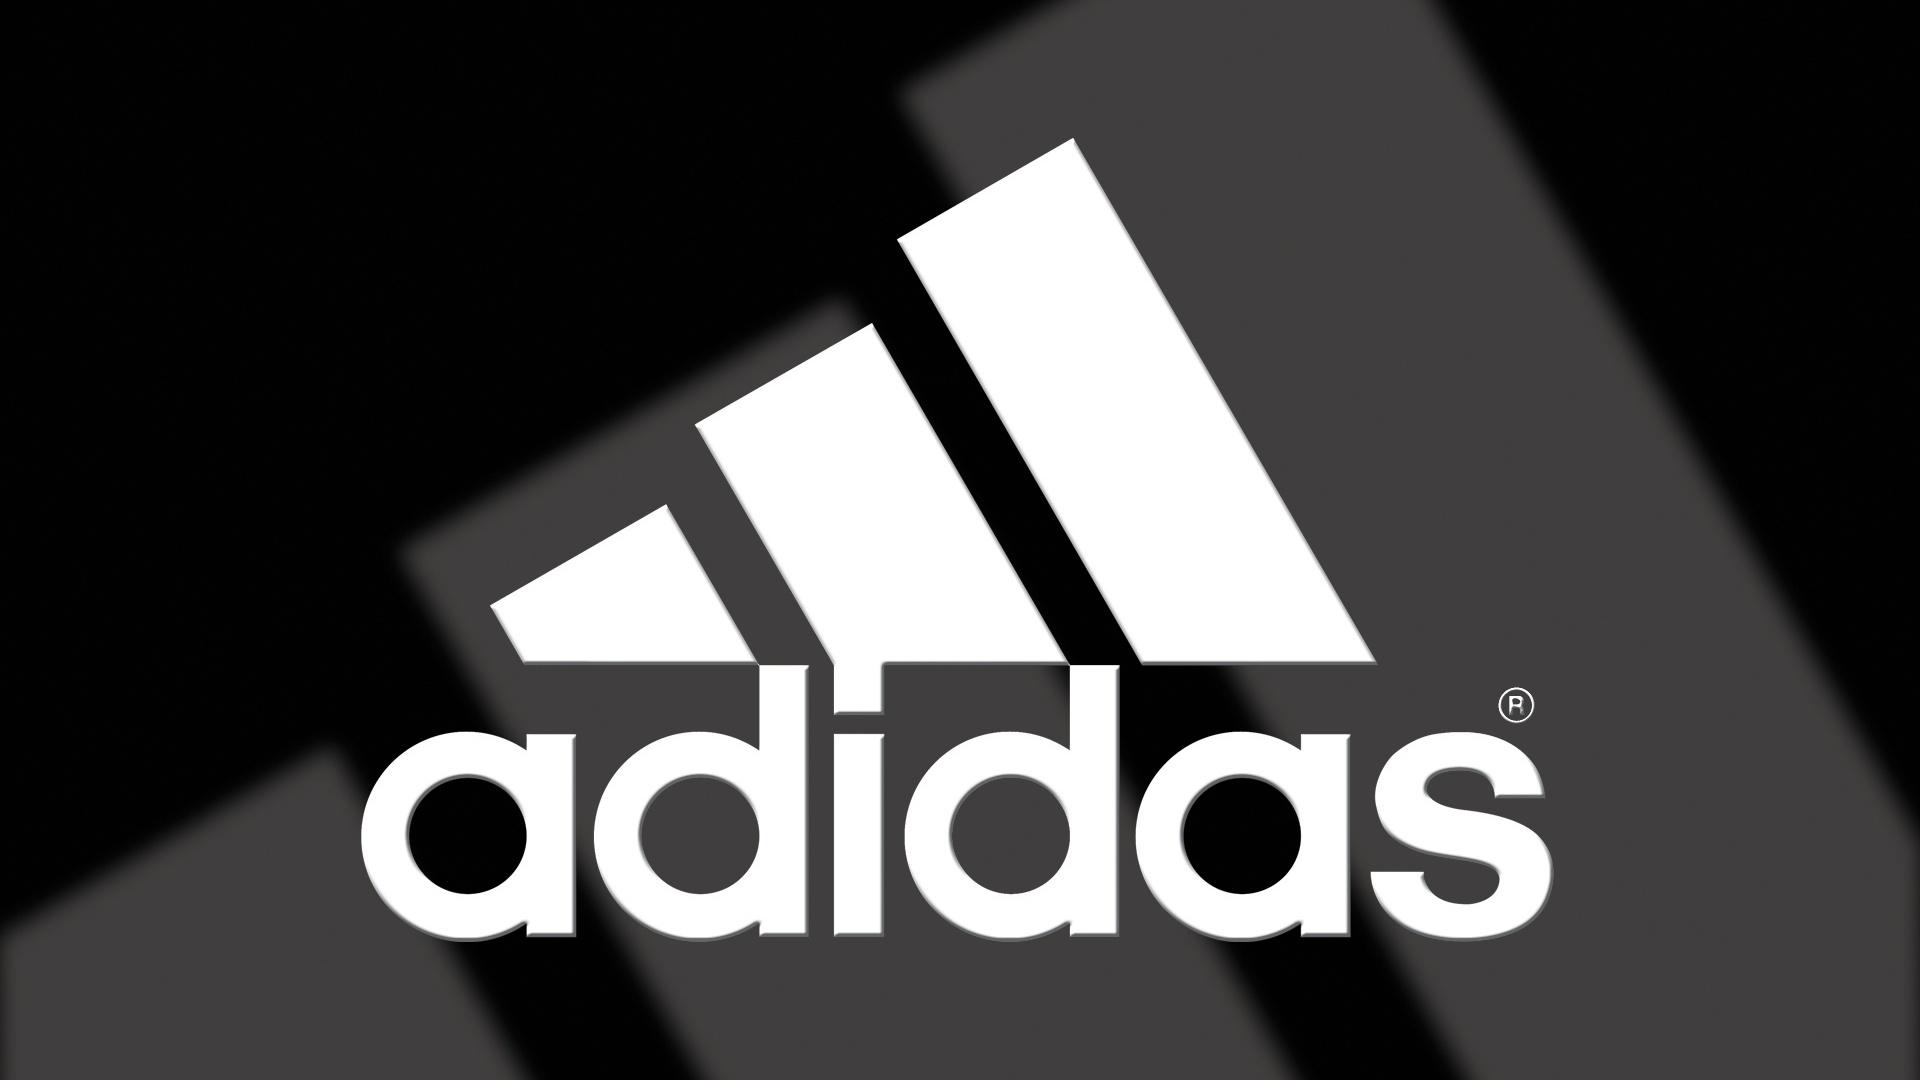 adidas blue logo 1920x1080 - photo #22